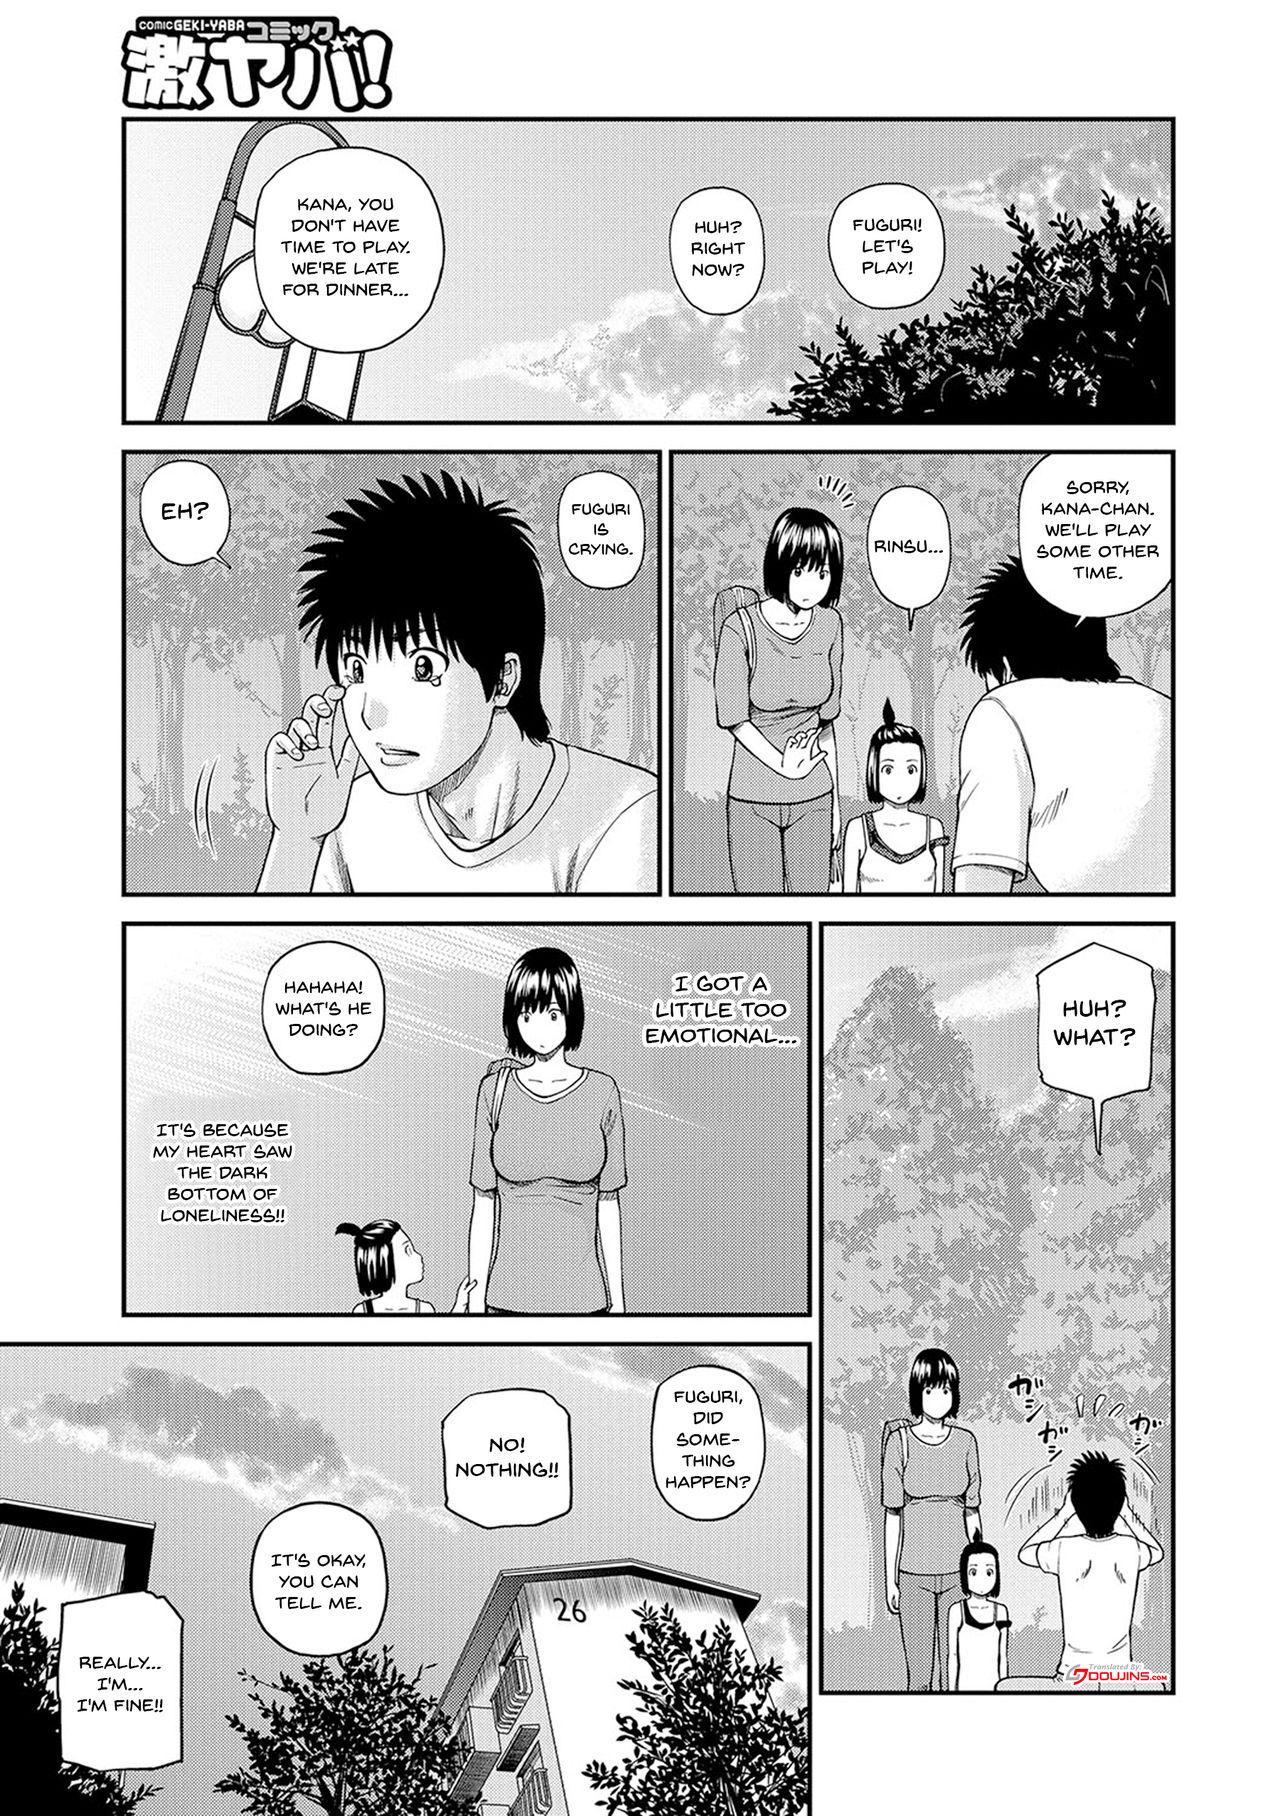 [Kuroki Hidehiko] Momojiri Danchi Mama-san Volley Doukoukai - Mom's Volley Ball | Momojiri District Mature Women's Volleyball Club Ch.1-9 [English] {Doujins.com} [Digital] 114